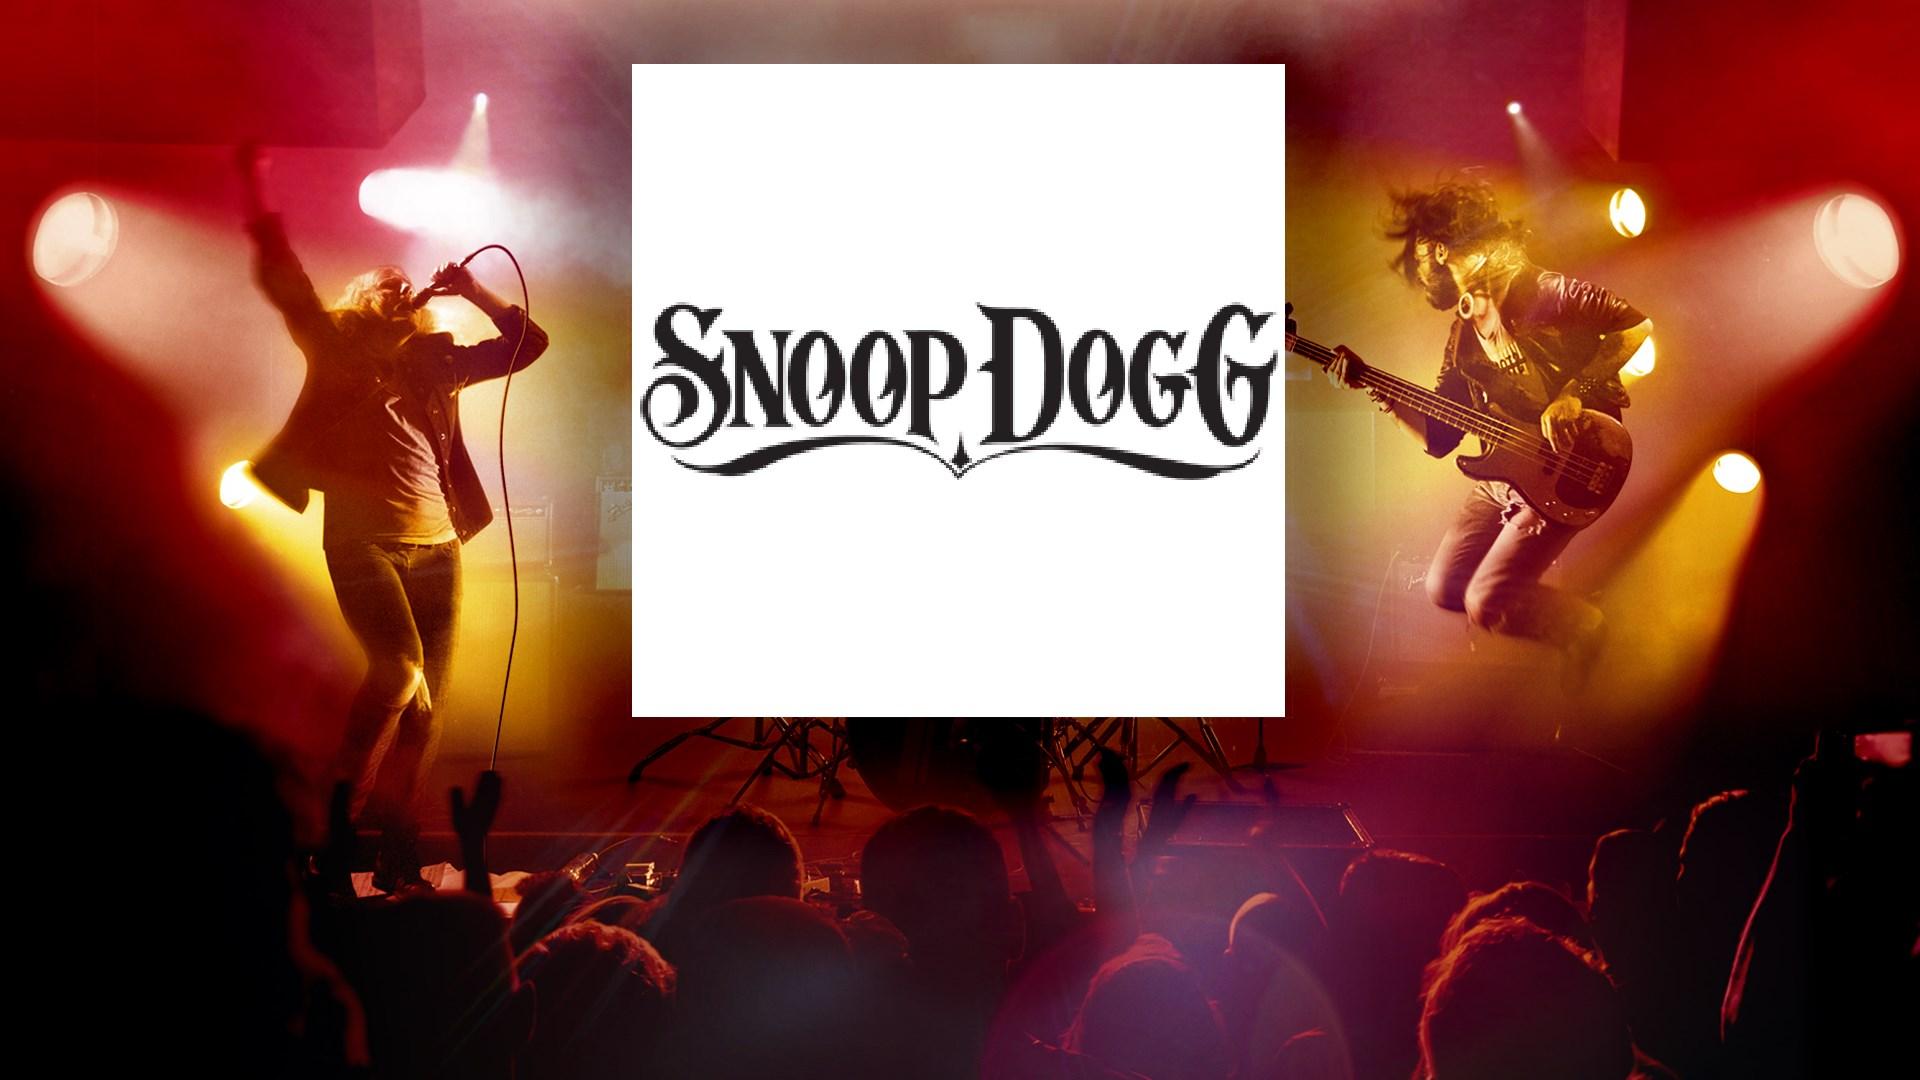 """Sensual Seduction"" - Snoop Dogg"